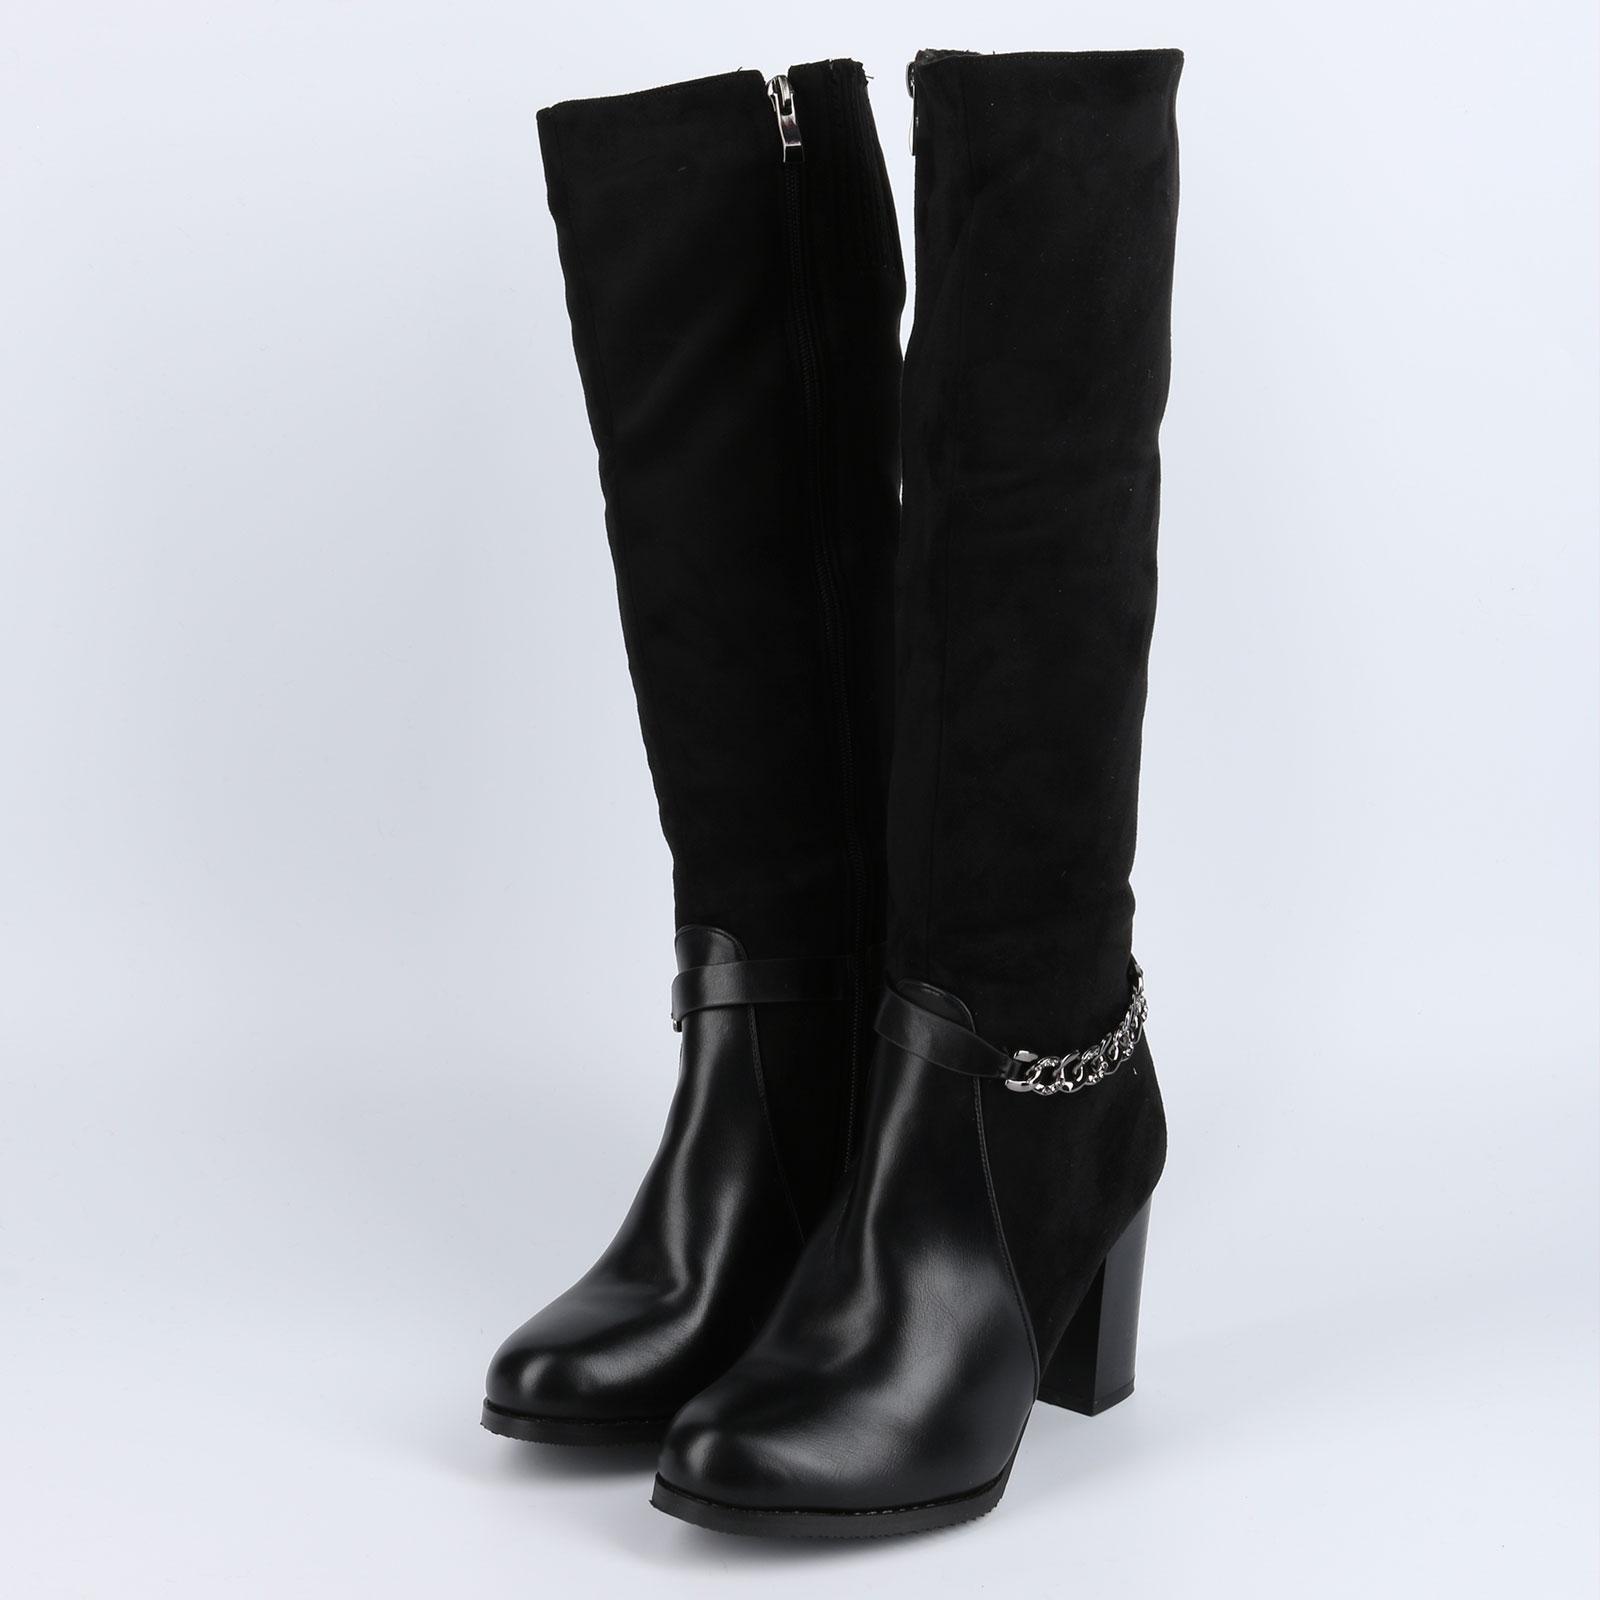 Сапоги женские на комбинированном каблуке